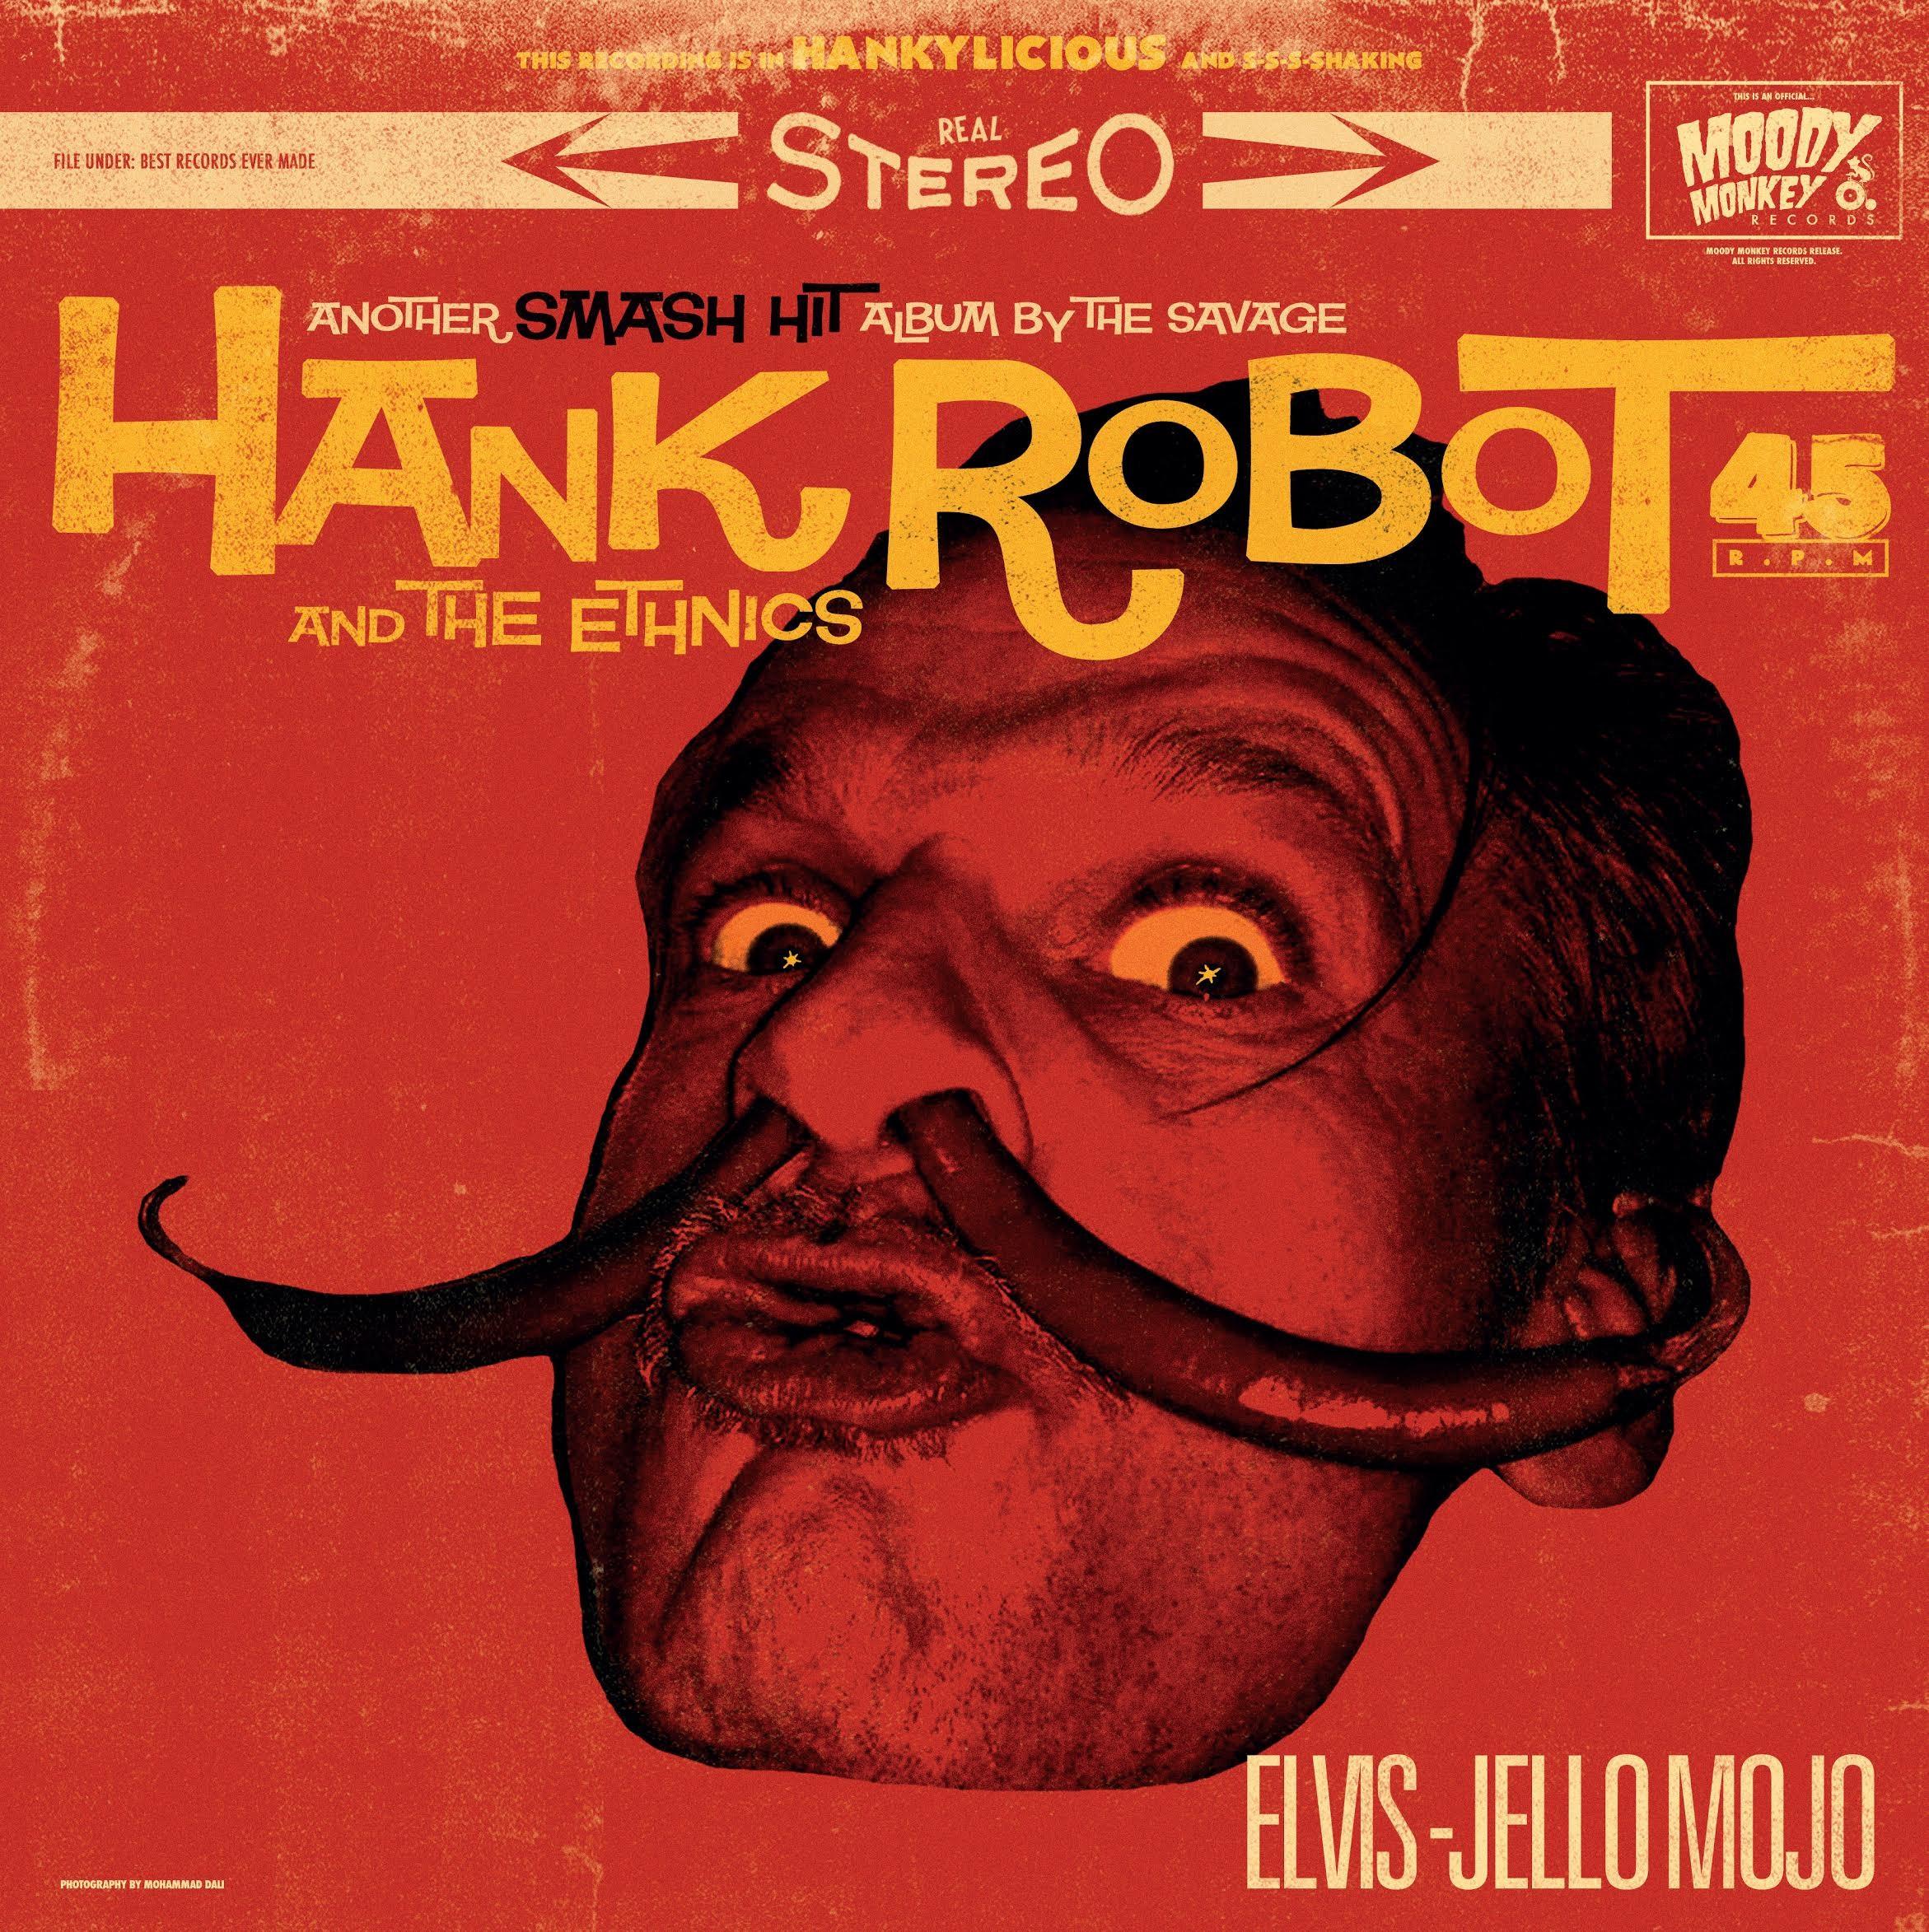 ORDER HANK ROBOT & THE ETHNICS